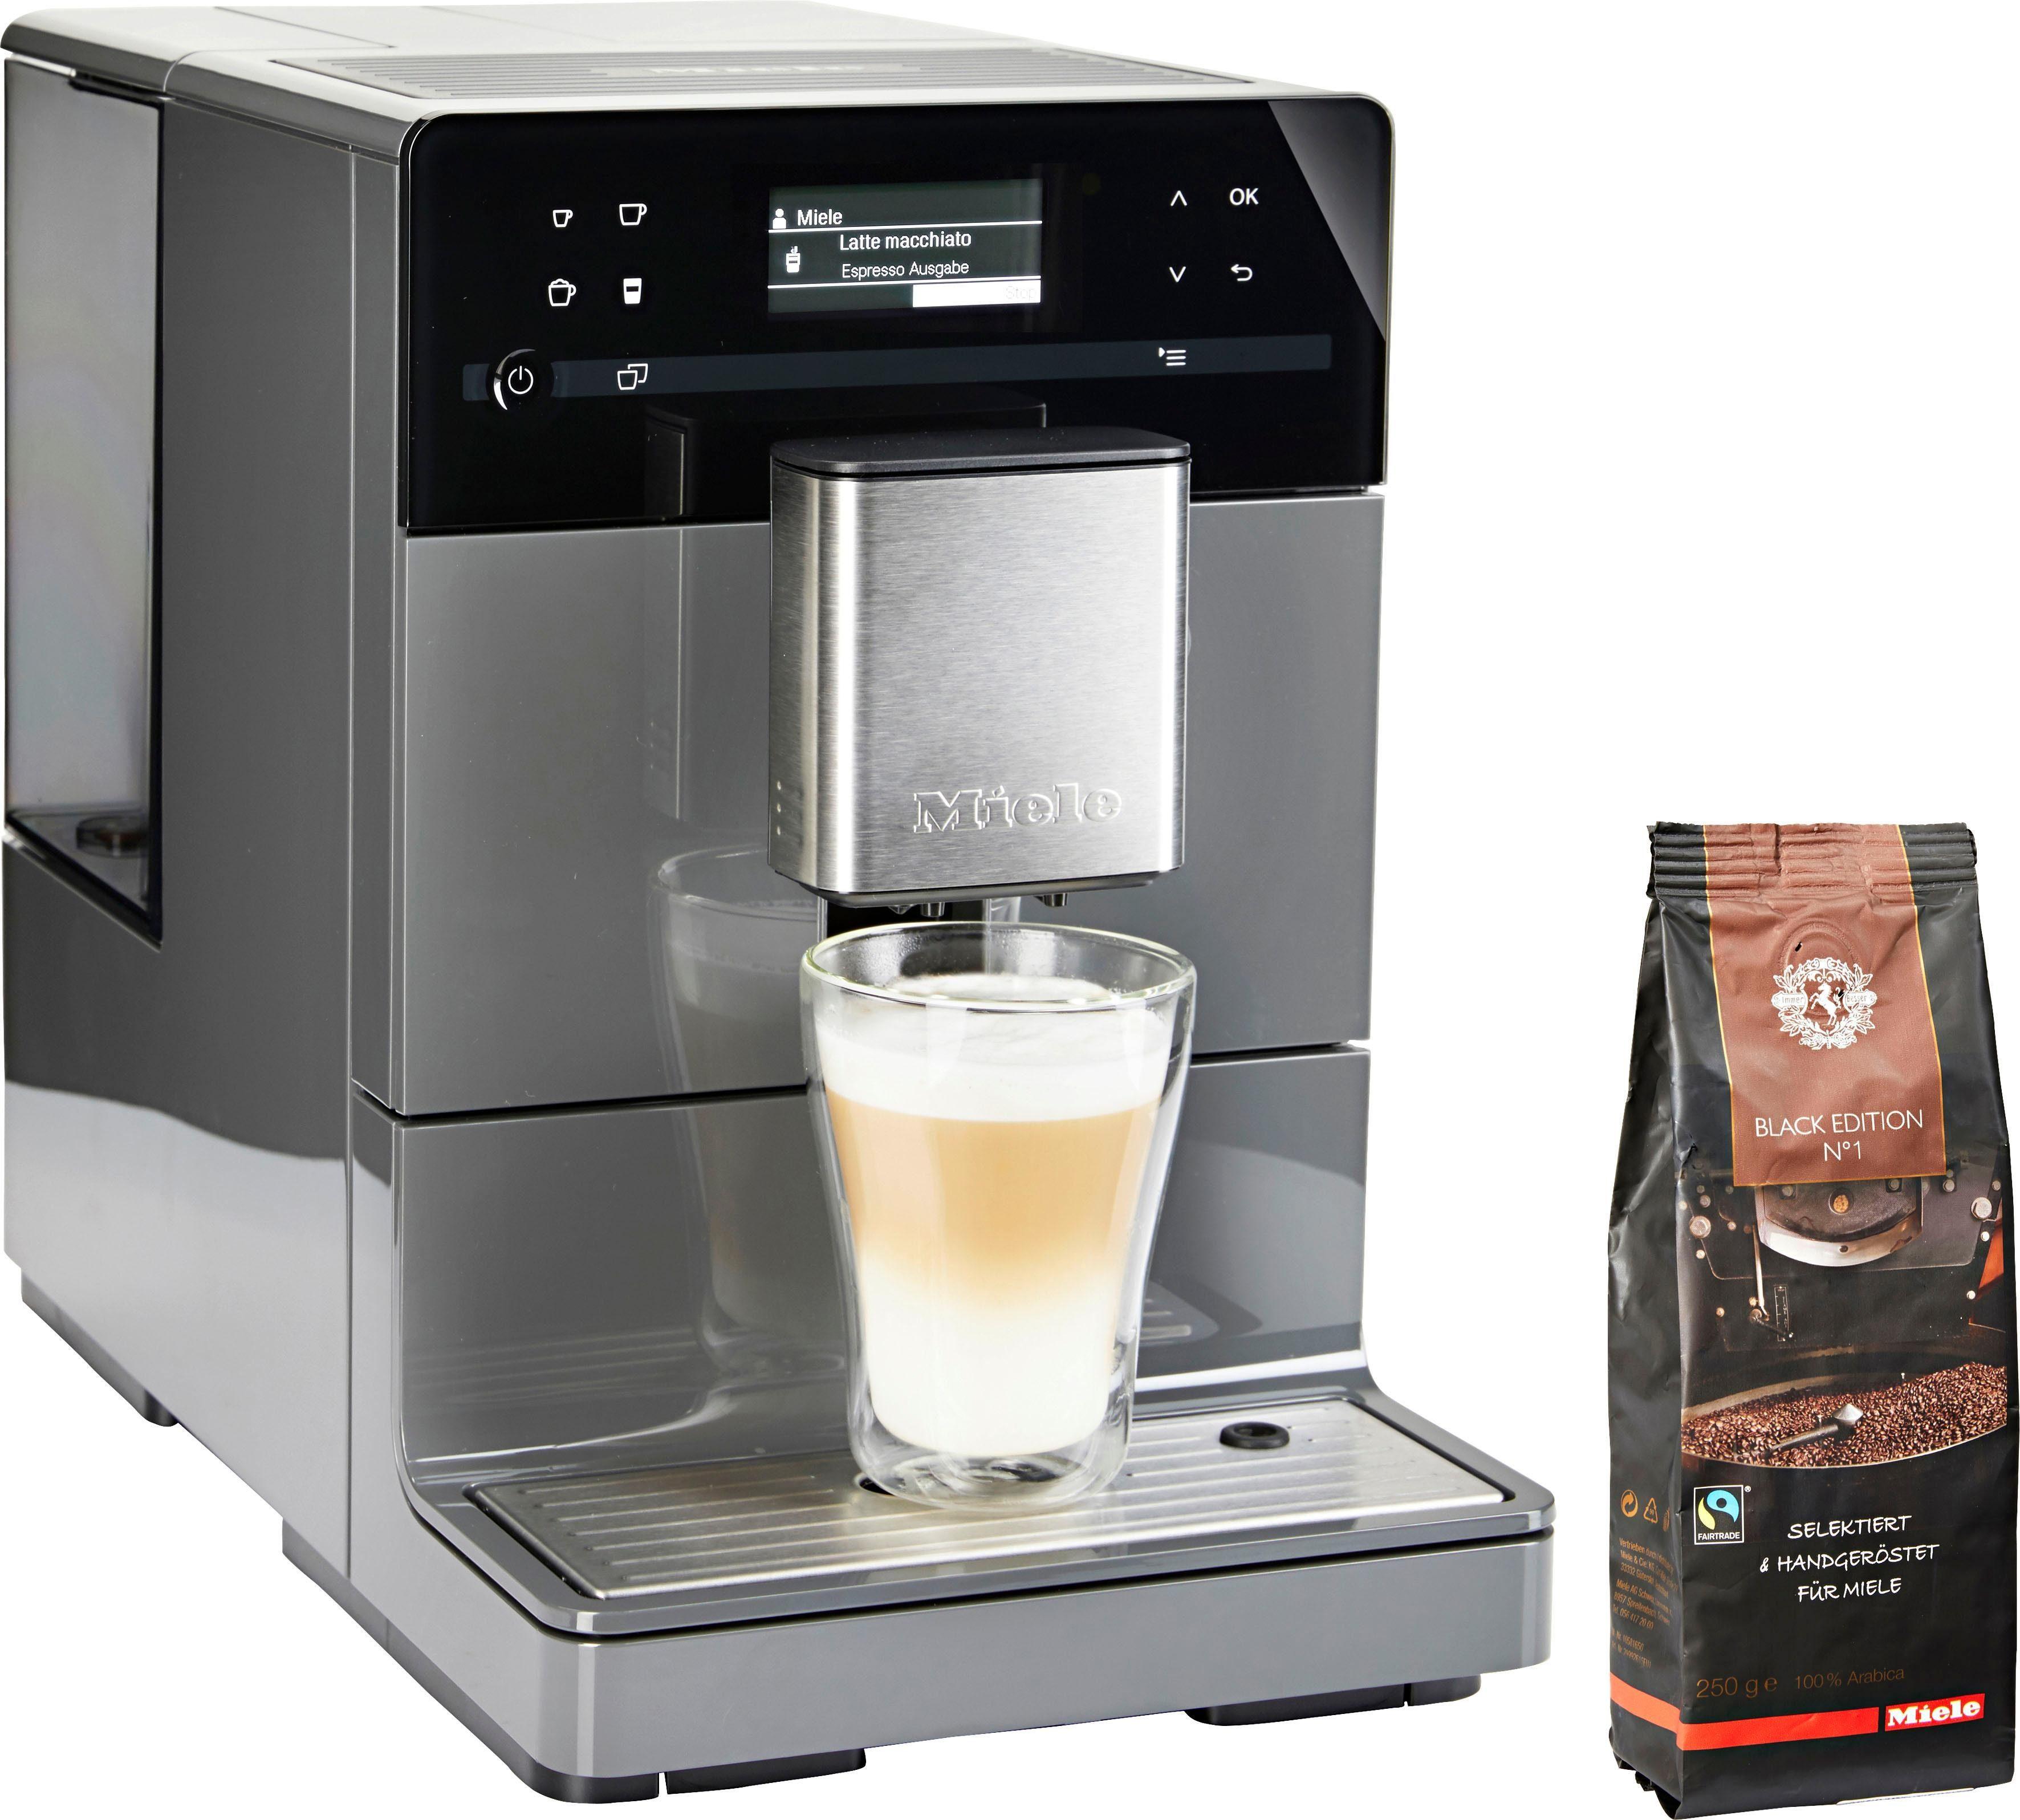 Miele Kaffeevollautomat CM5300 Graphitgrau, mit Vorbrühsystem